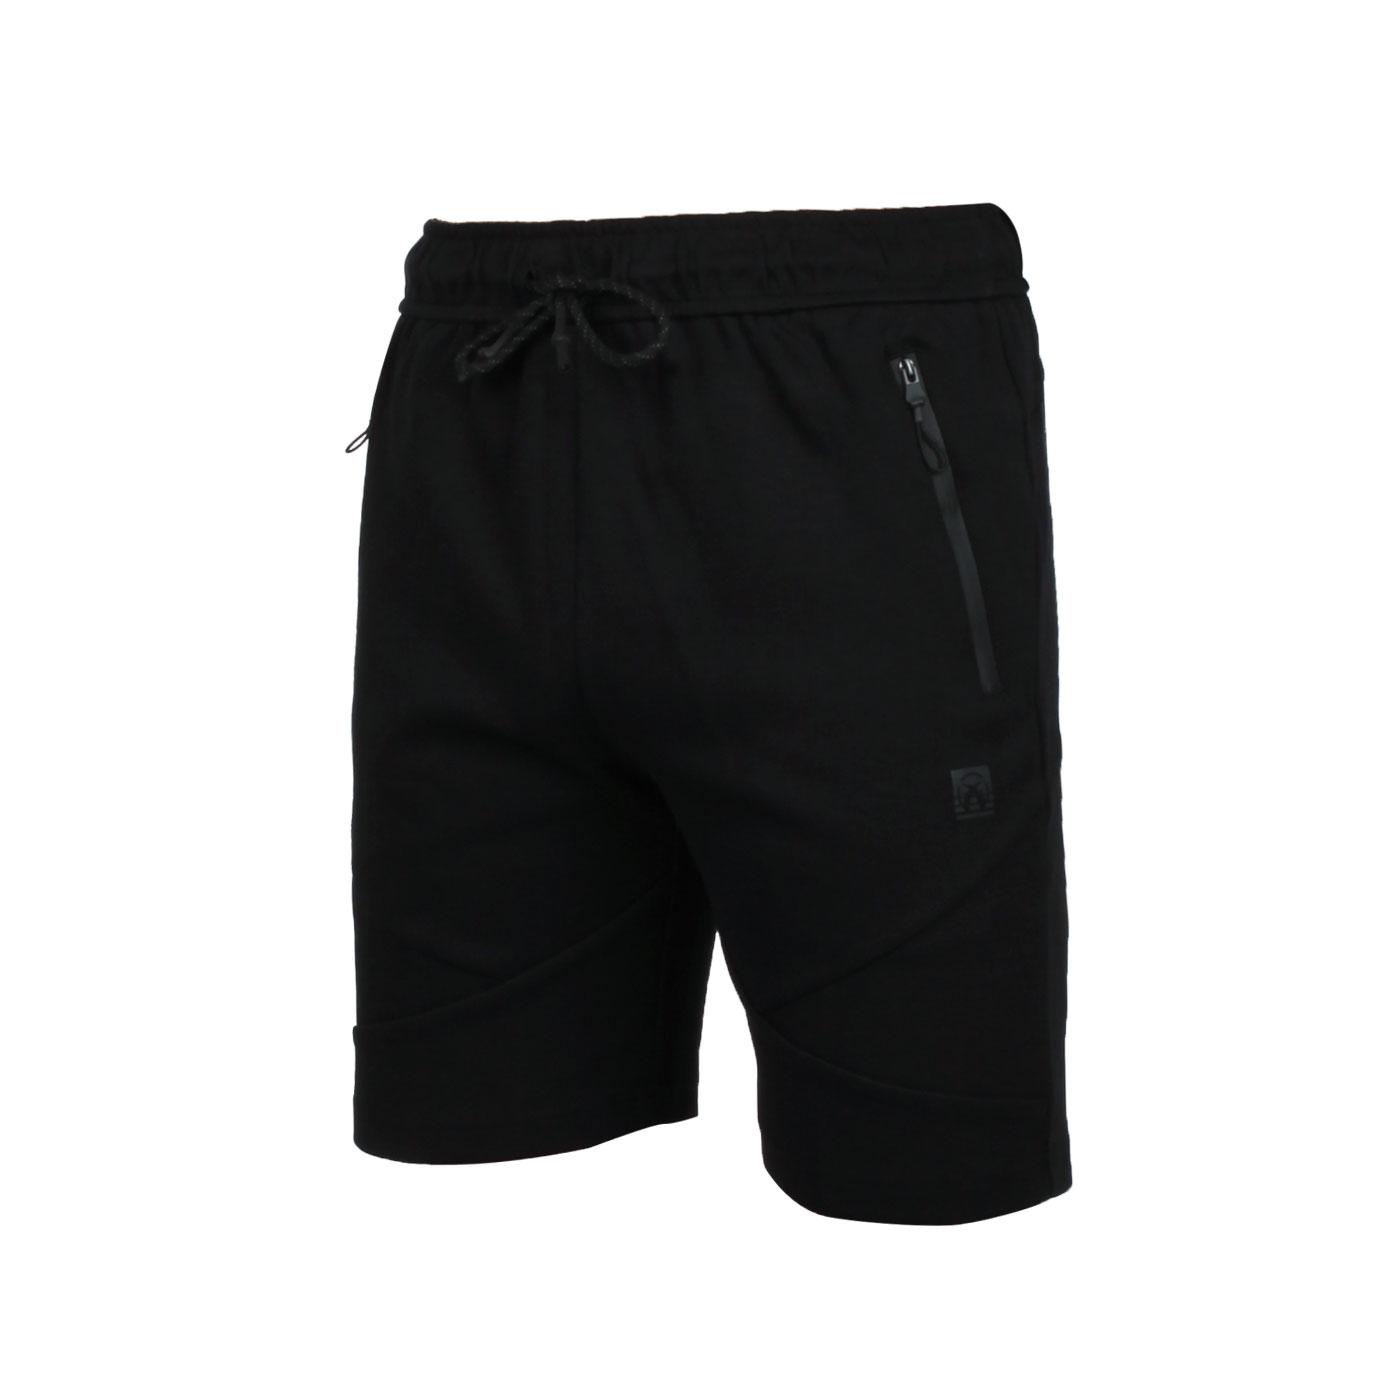 FIRESTAR 男款棉質休閒短褲 C0521-10 - 黑